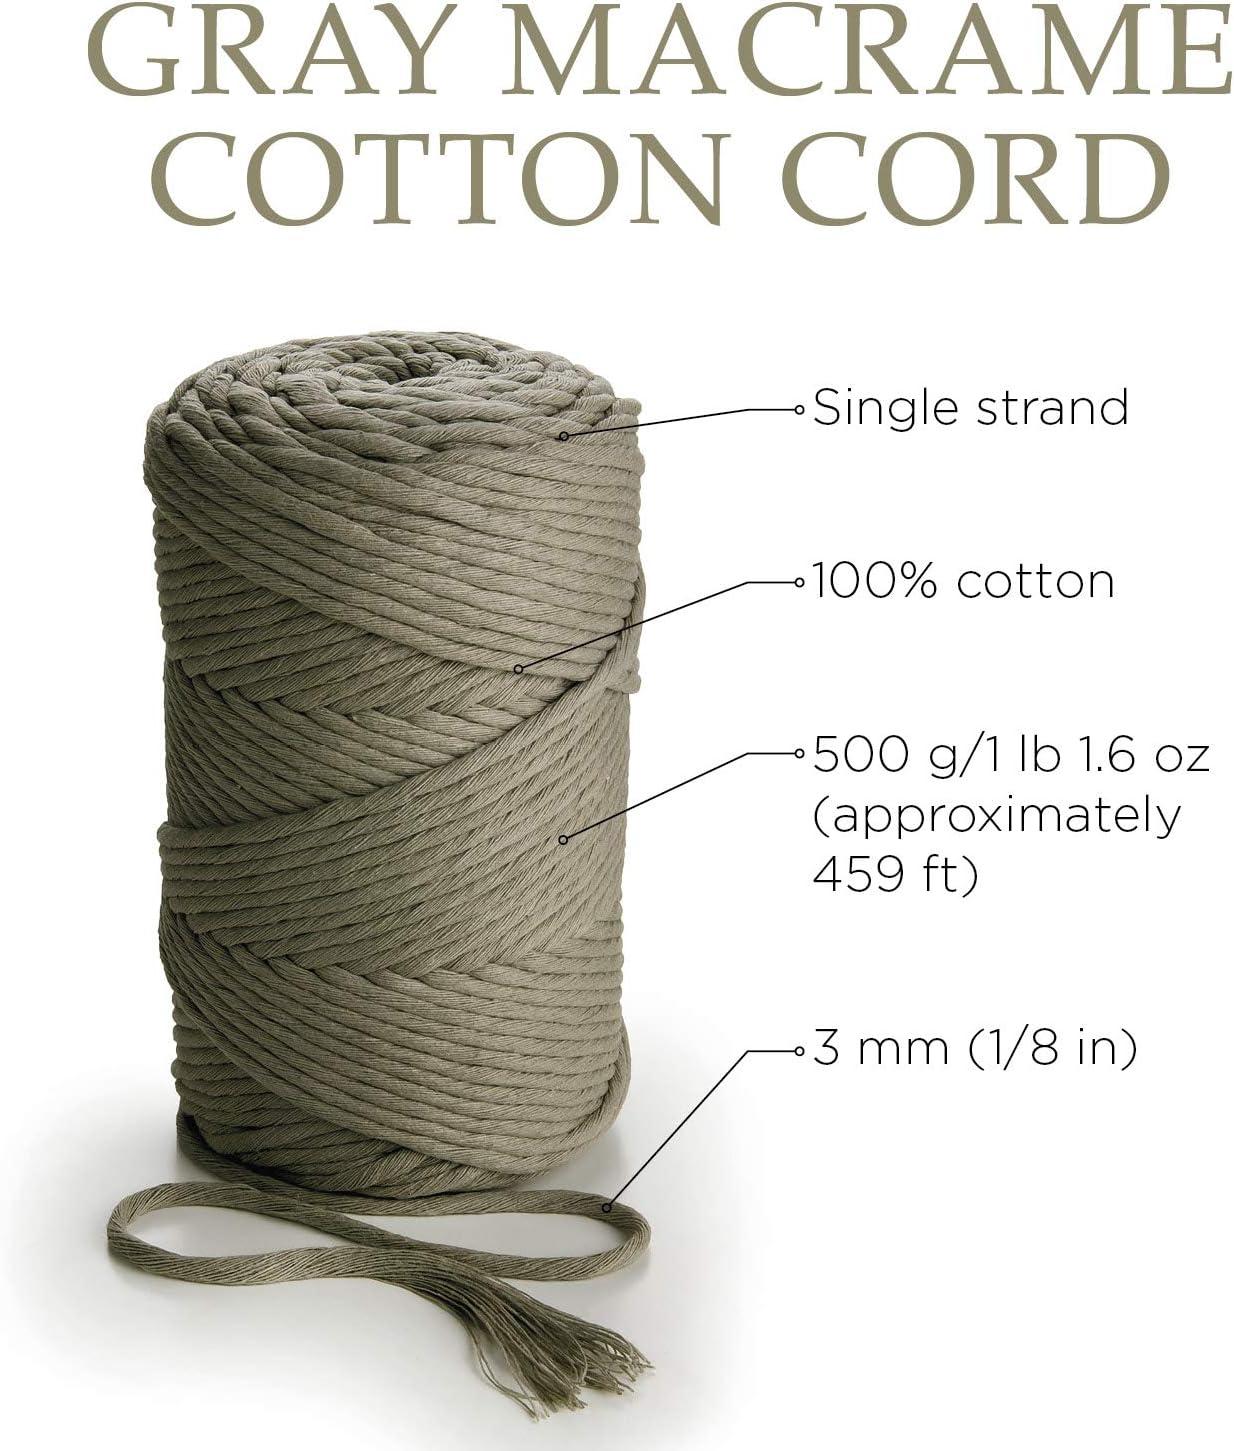 31-MIDNIGHT BLUE Macrame Cotton String 100/% Cotton Super Soft String 5mm Coloured Macrame String Single Twist 1kg